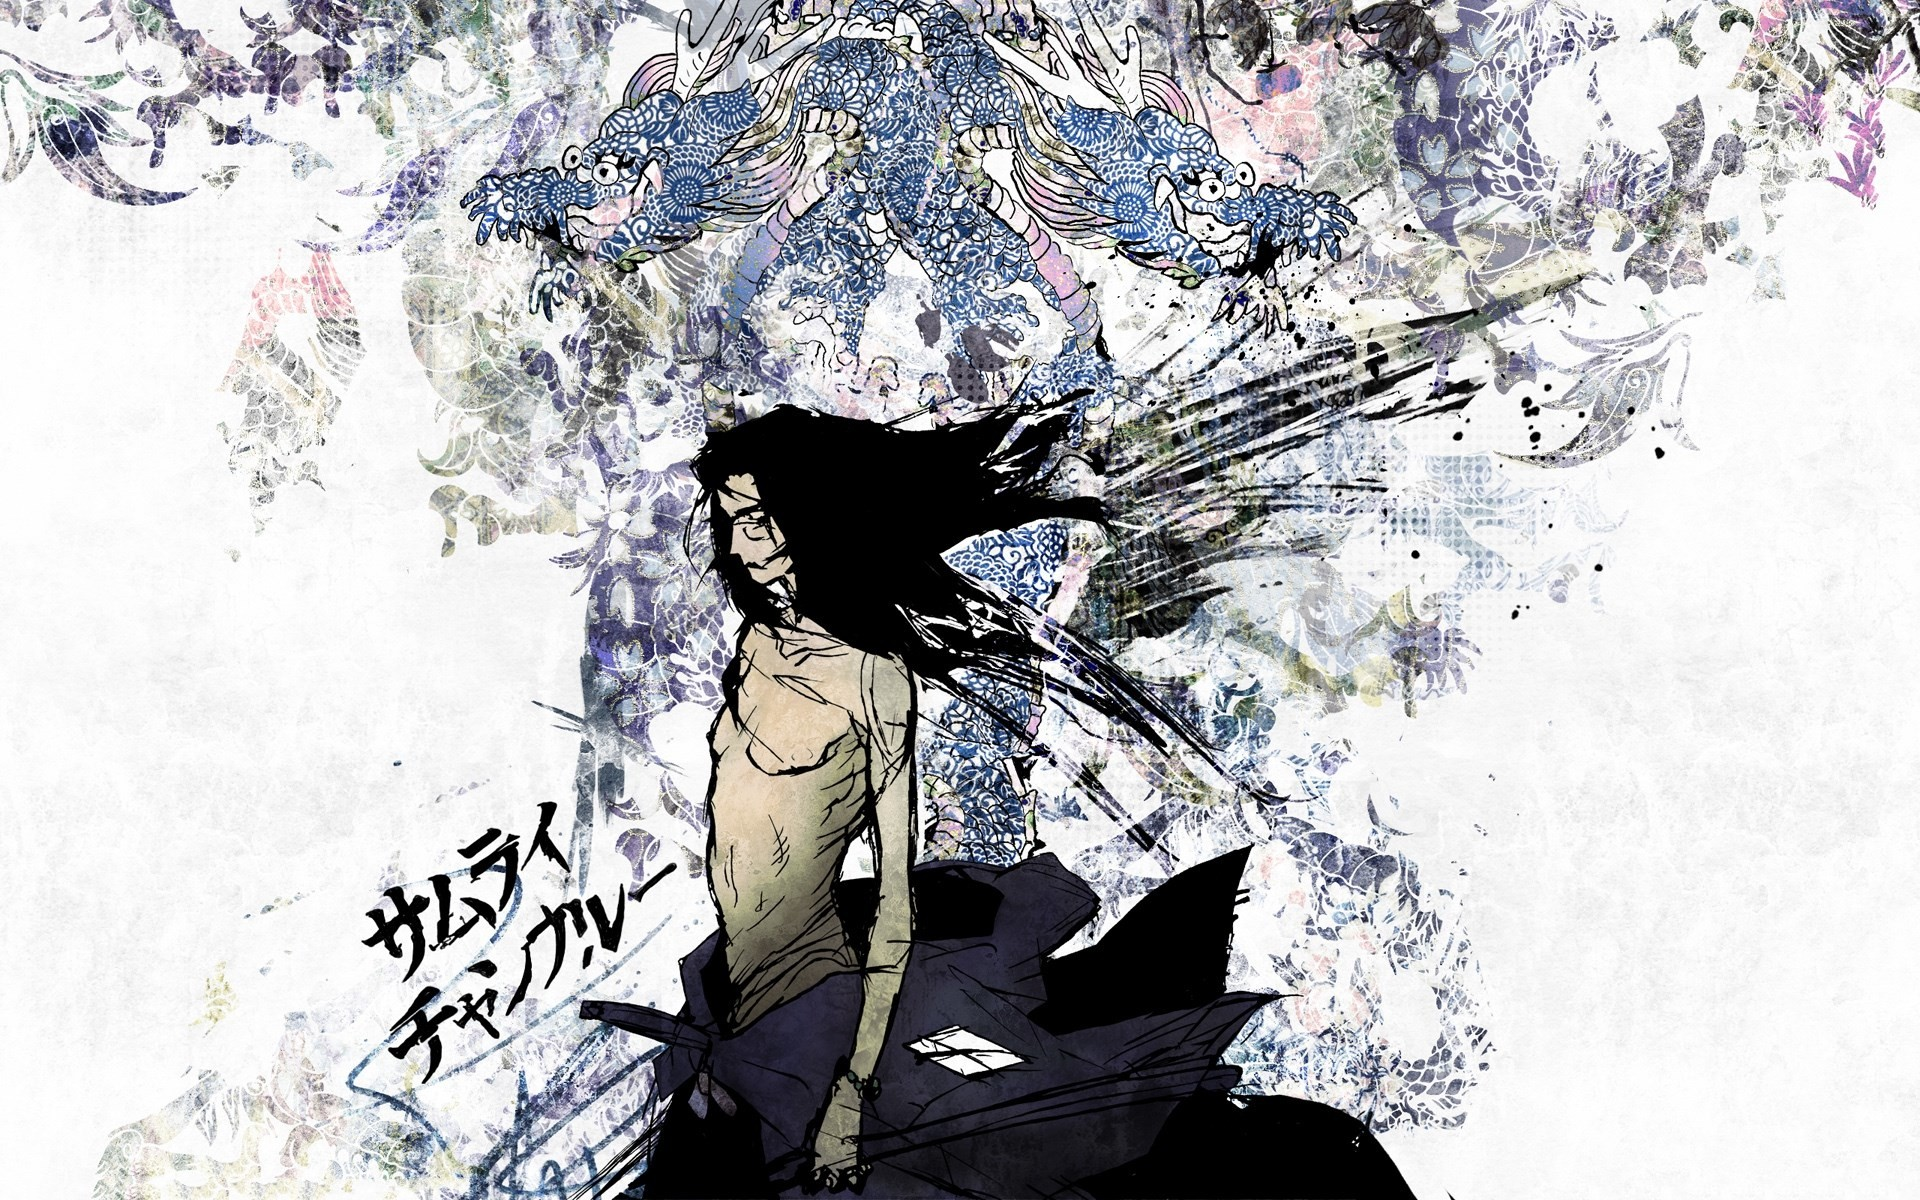 hd samurai champloo image 2